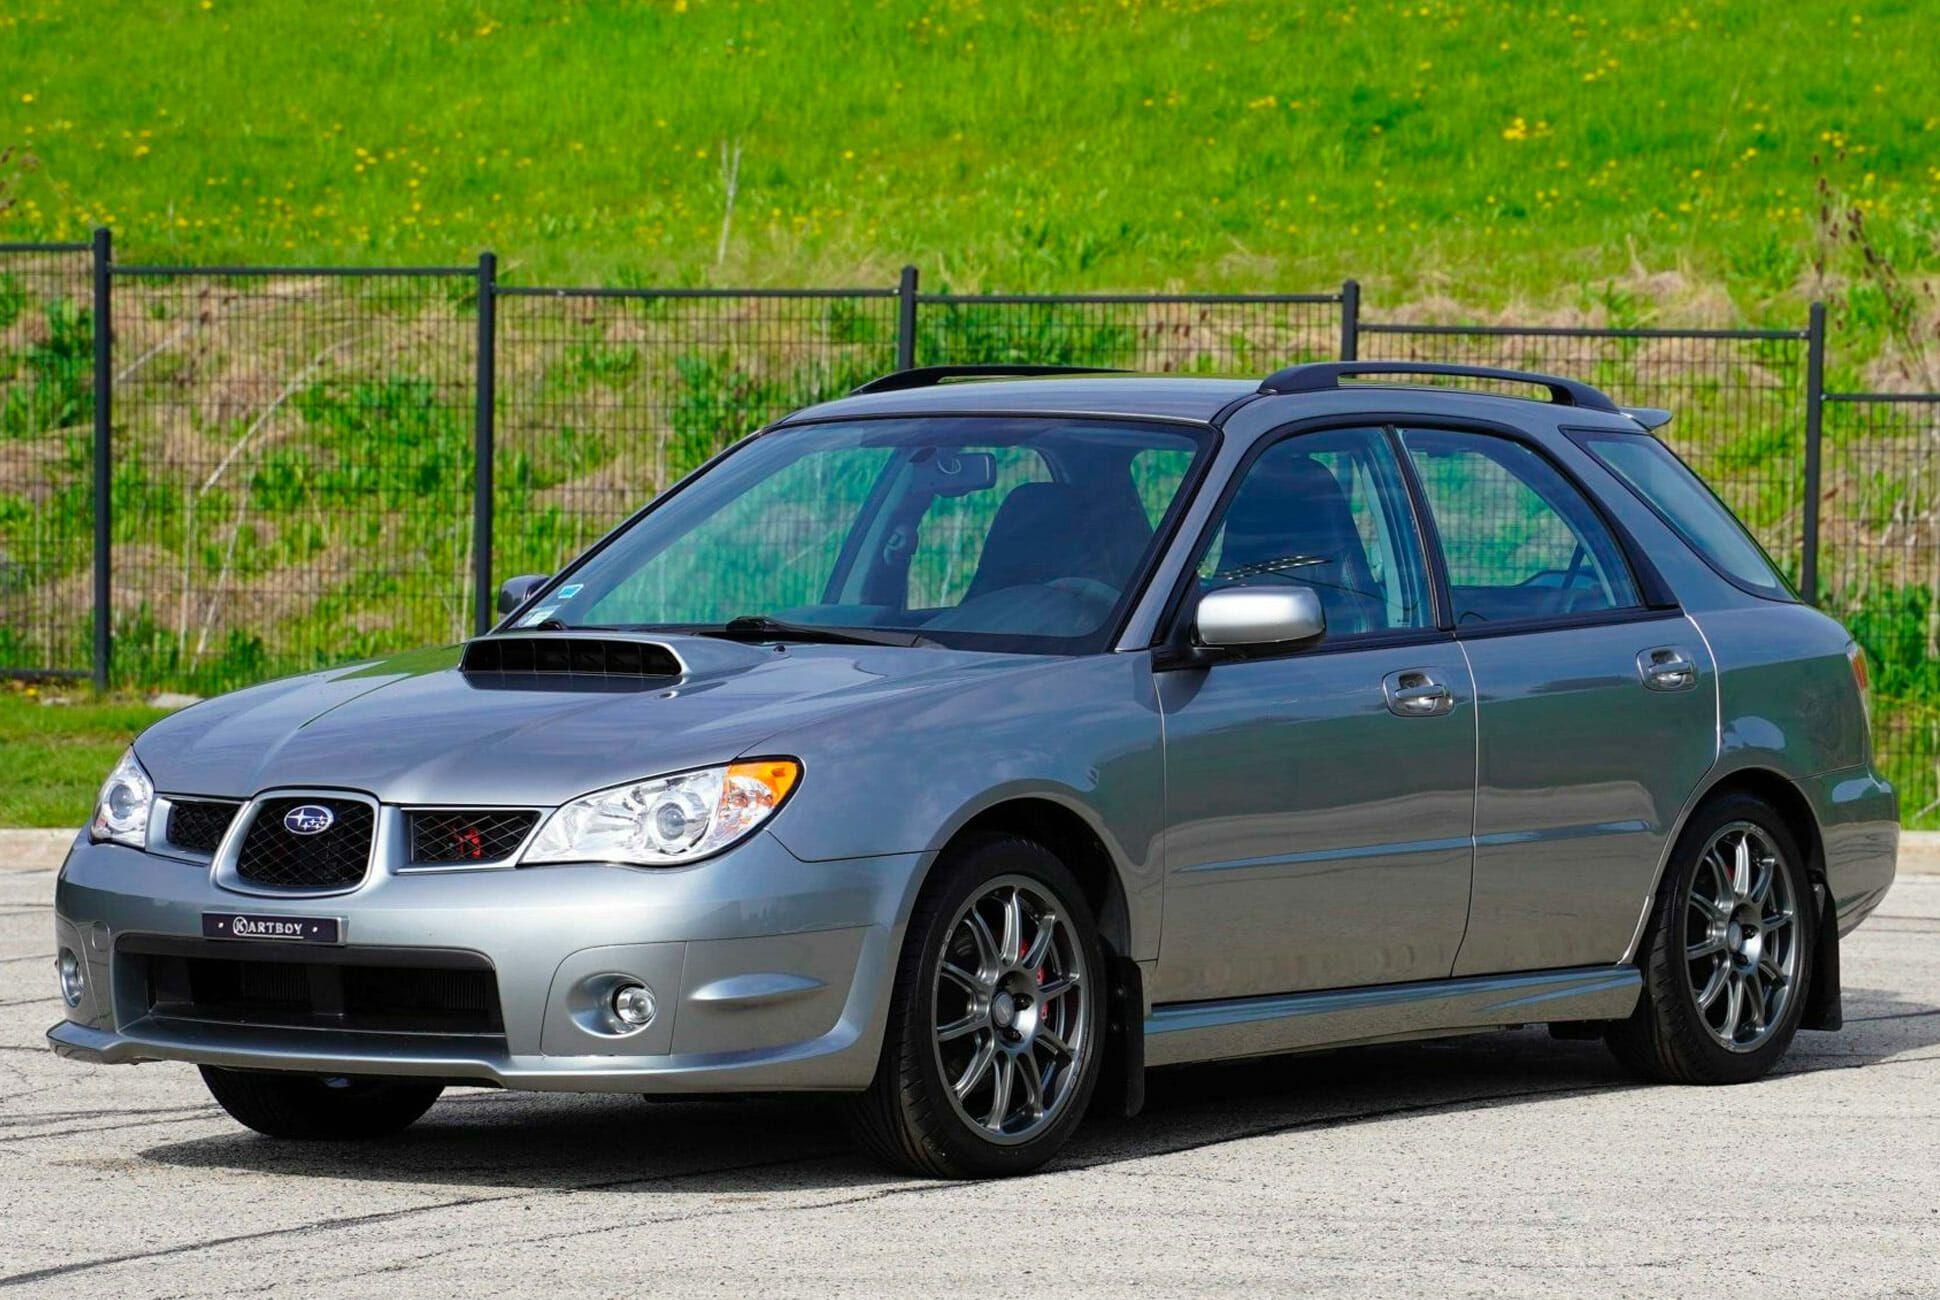 2007-Subaru-WRX-Wagon-14K-Miles-gear-patrol-slide-1